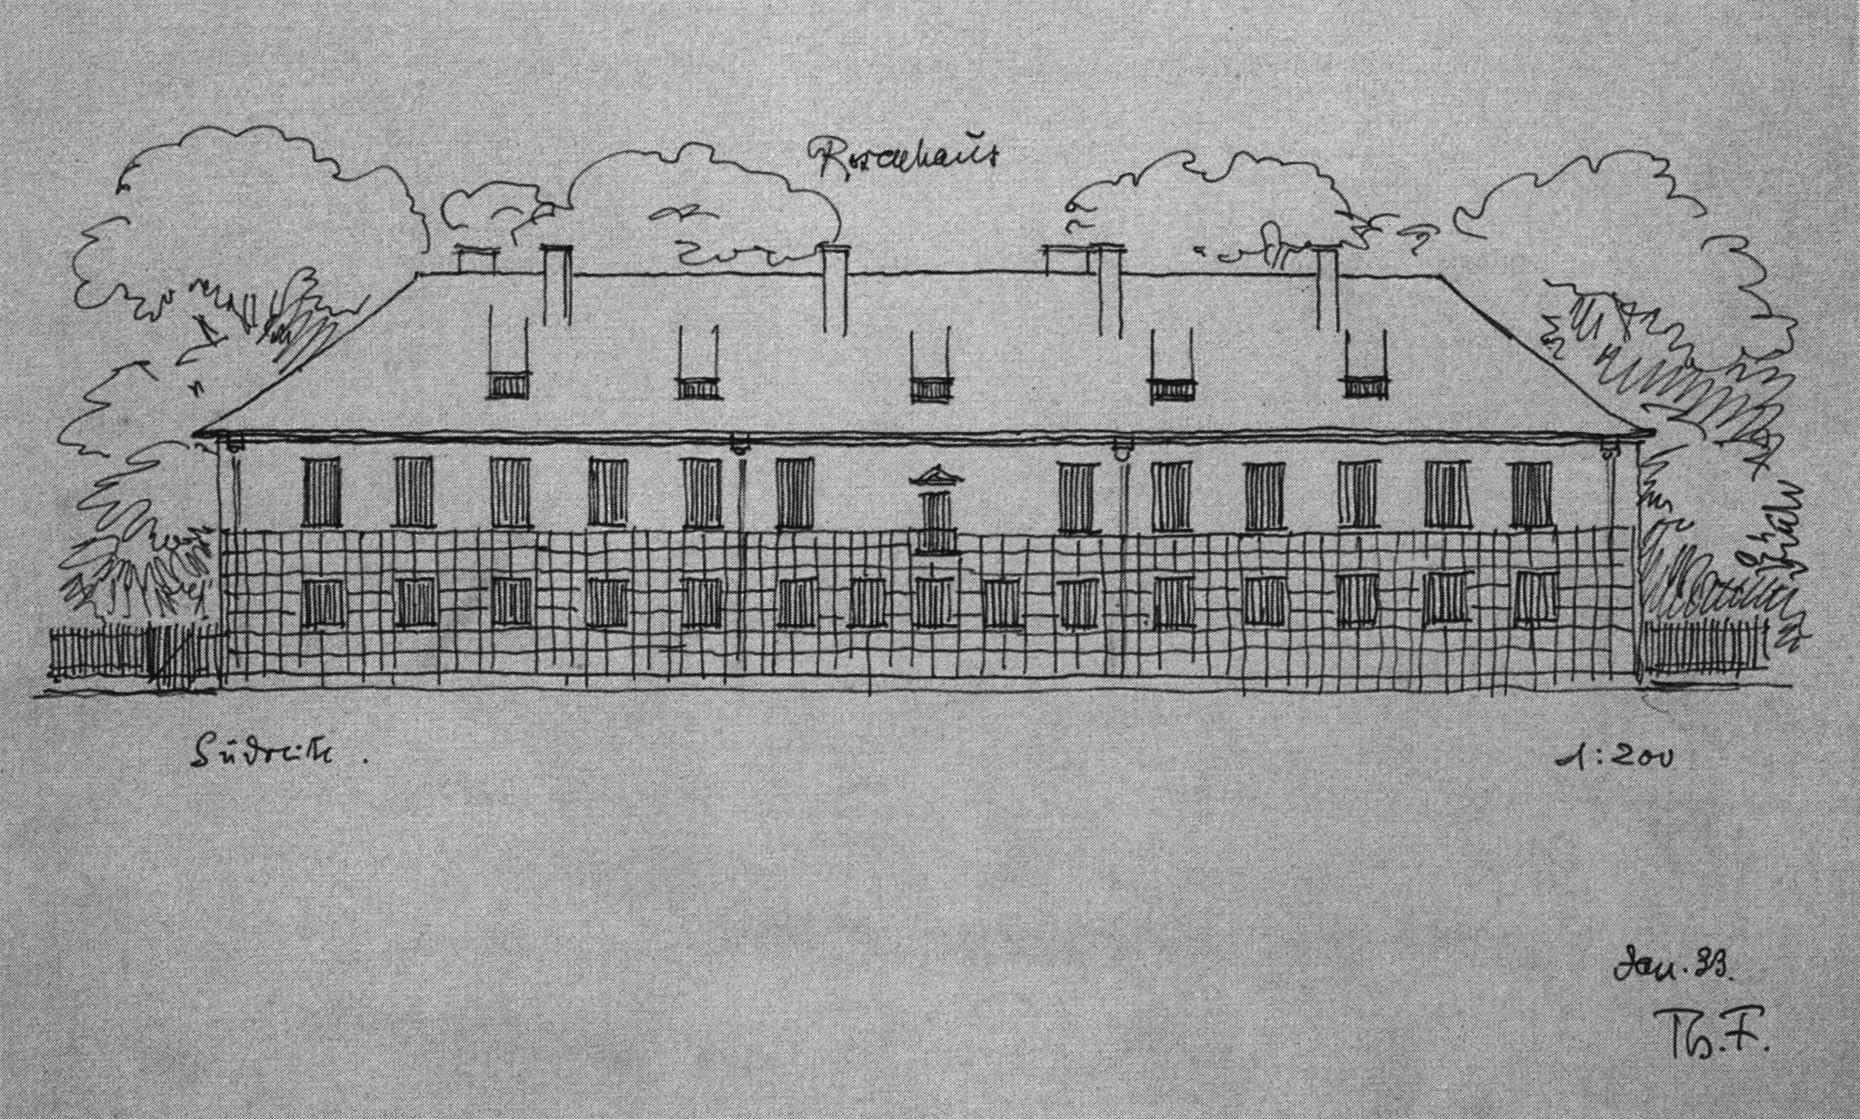 Adalbert Stifter S Rosenhaus As Influential Architecture Fantasy Stylepark